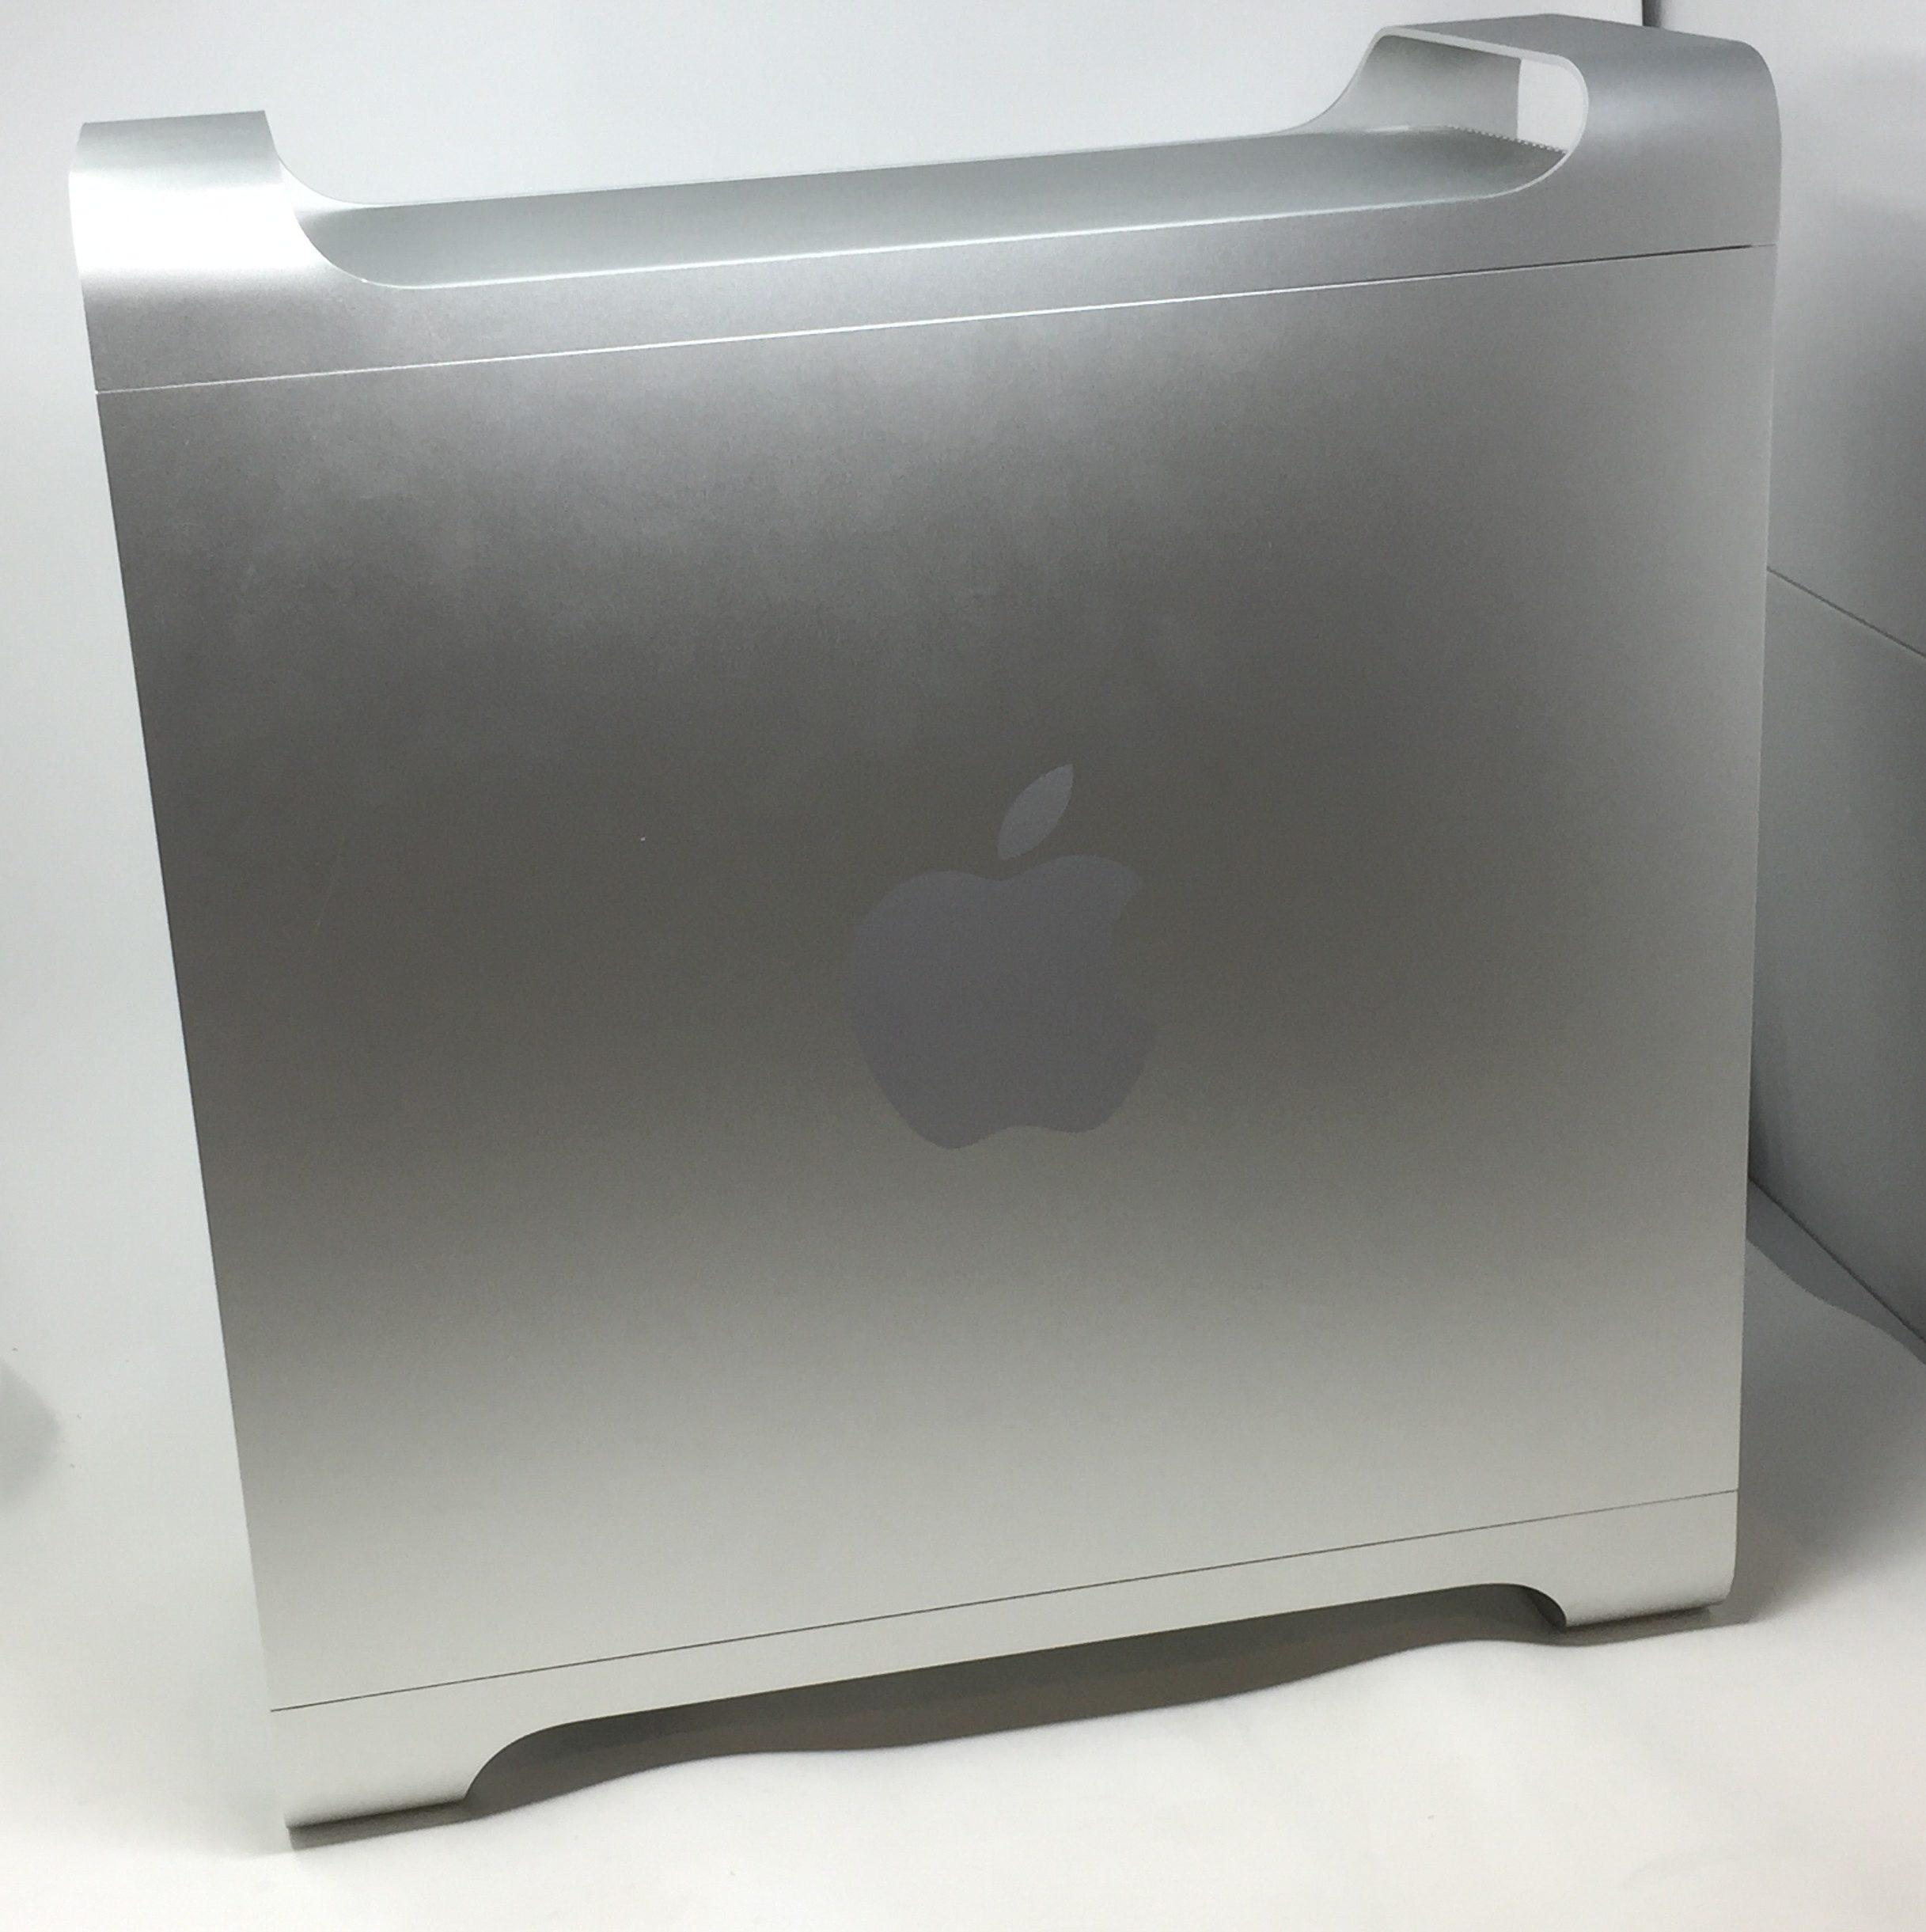 Mac Pro Mid 2012 (2 x Intel Xeon 2.66 GHz 32 GB RAM 1 TB SSD), 6 Core Intel Xeon 2,66 GHz (tiene 2  procesadores iguales), 48 GB DDR3 (ECC) 1333MHz, 4 SSD de 512 GB cada una, imagen 2